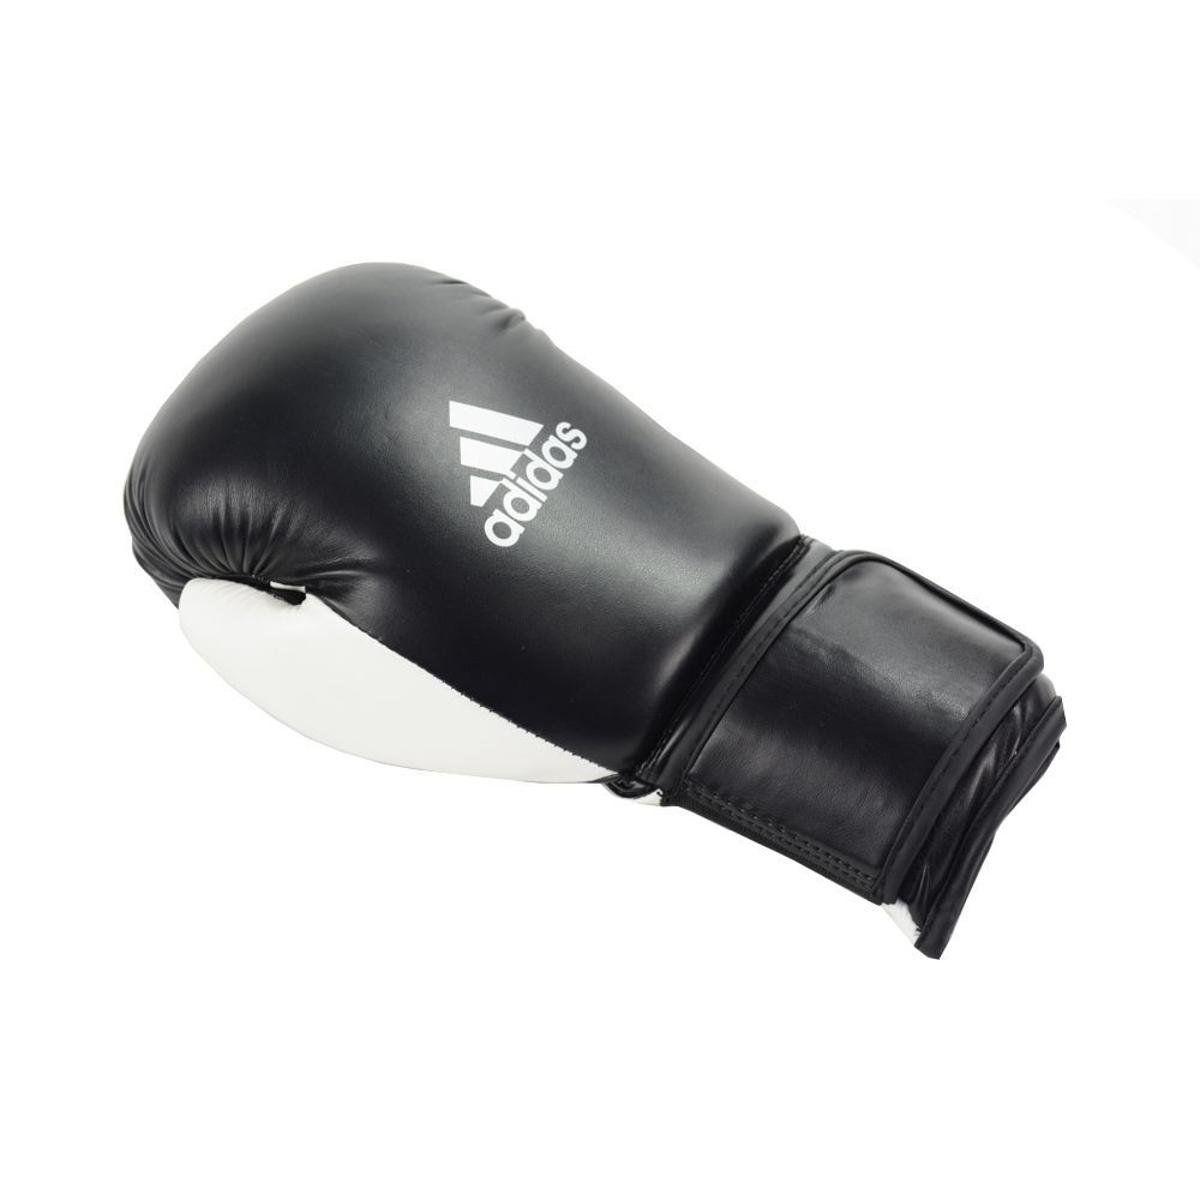 Kit Luvas Boxe / Muay Thai - Adidas Power 100 - Preta / Branca - 10/12/14 OZ  - Loja do Competidor